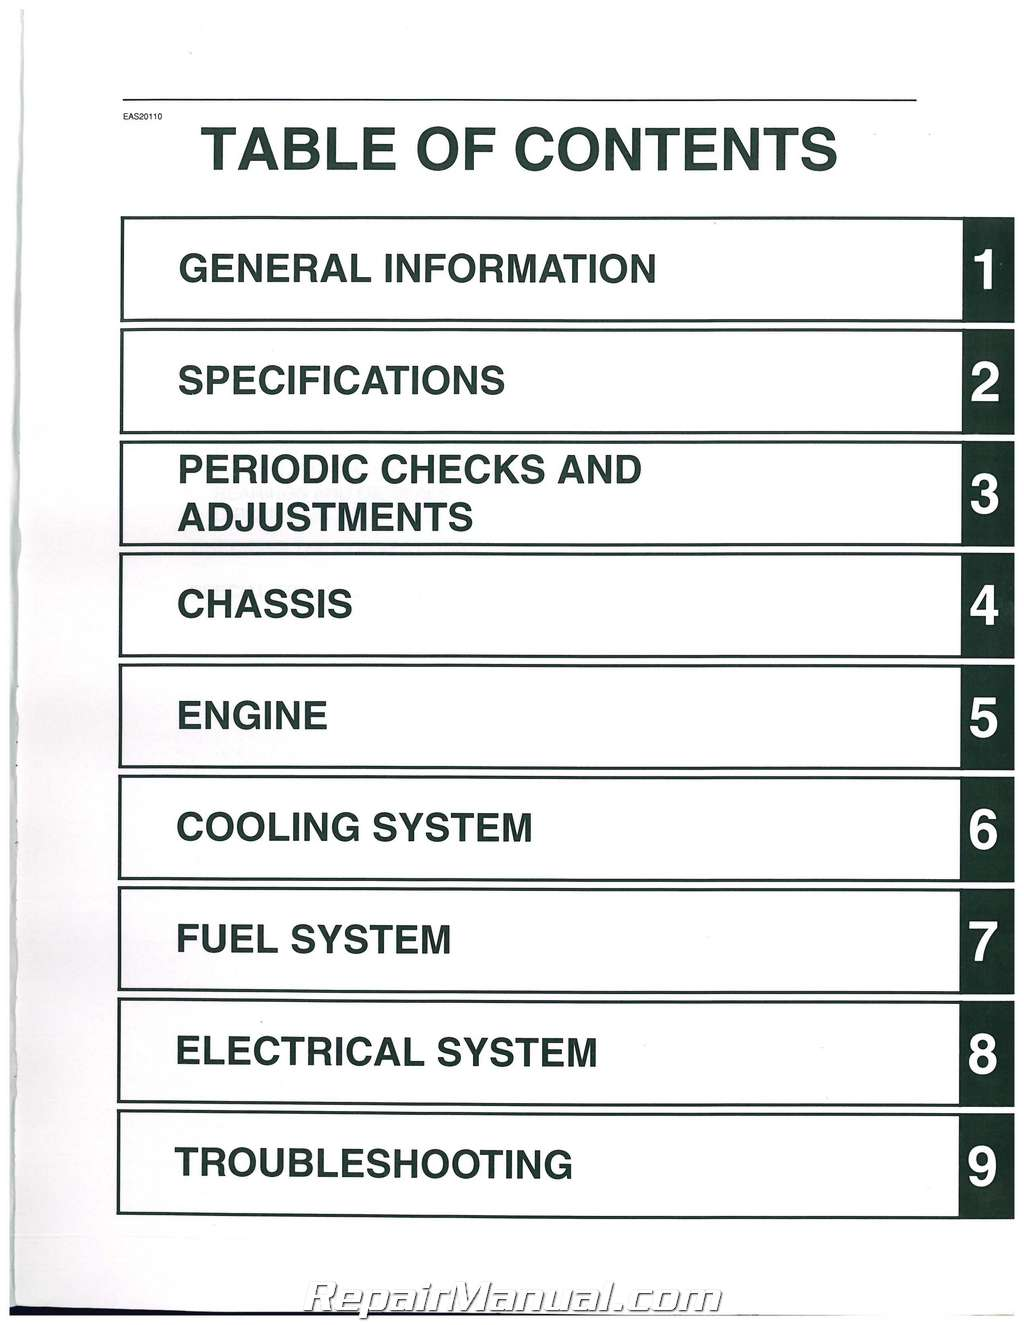 Manuale htc u11